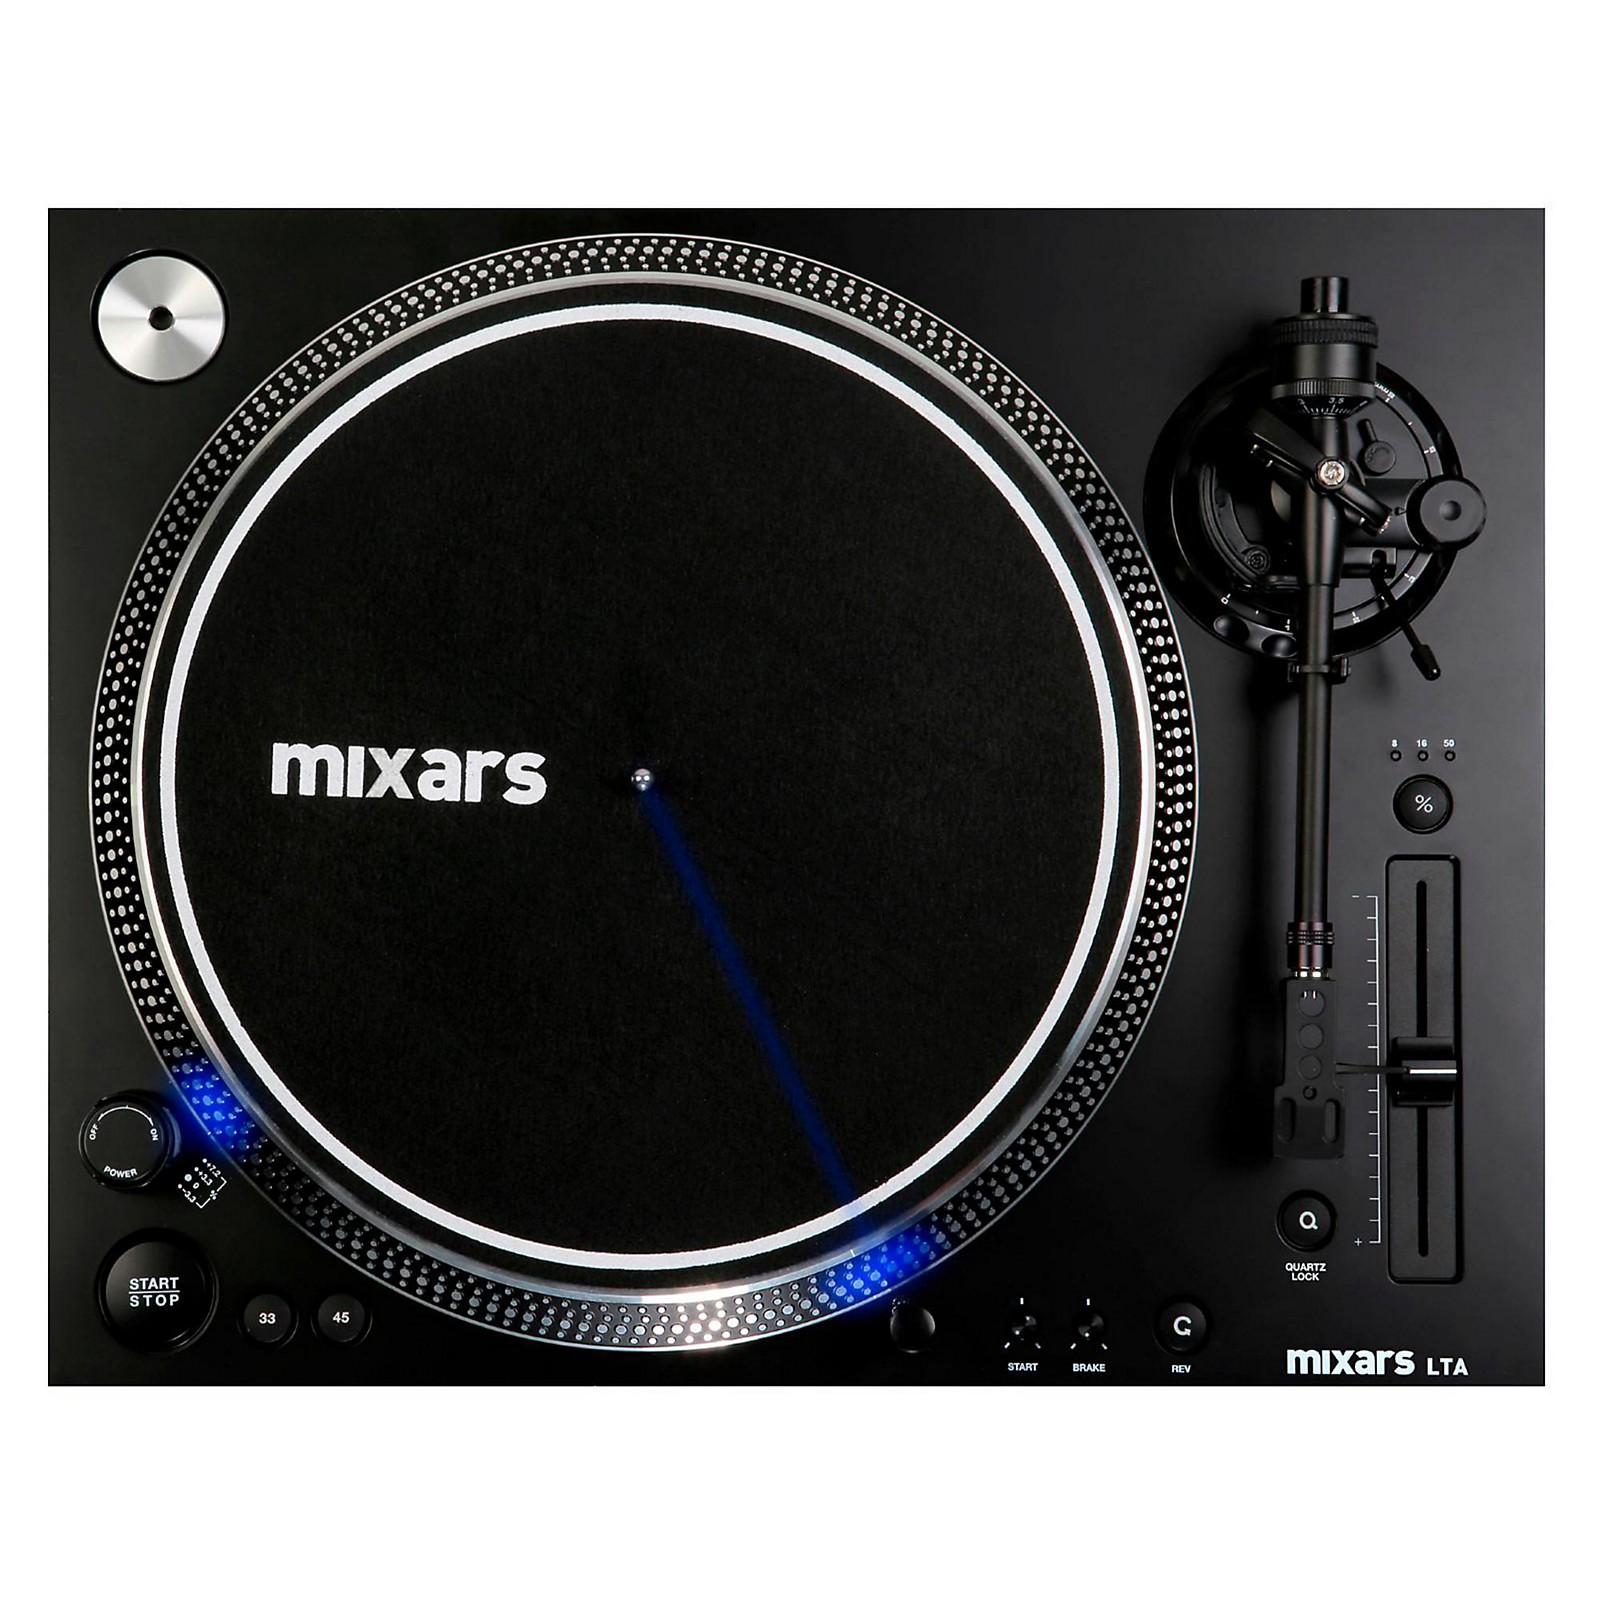 Mixars LTA Direct Drive High Torque Turntable